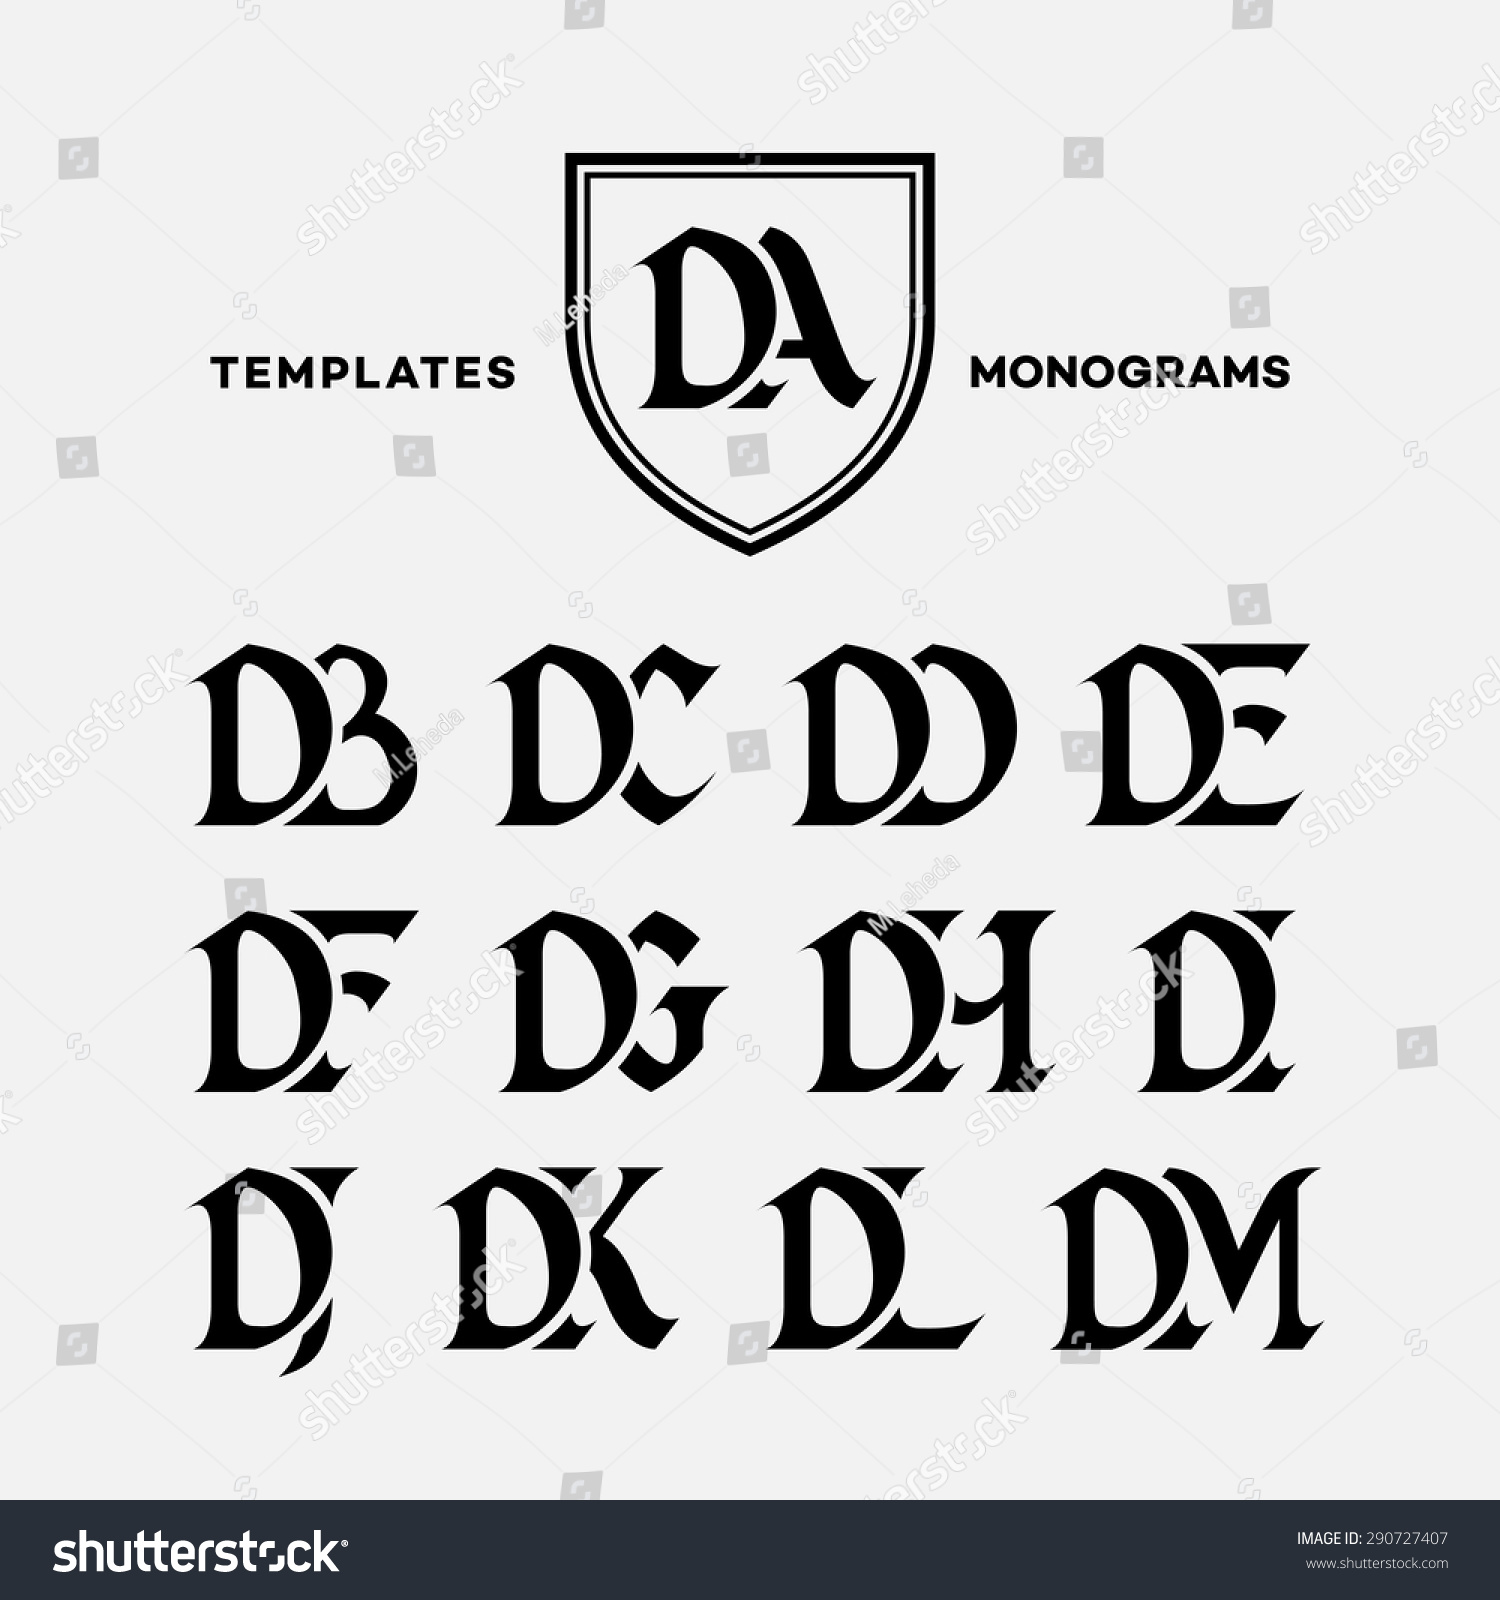 monogram design template with combinations of capital letters da db dc dd de df dg dh